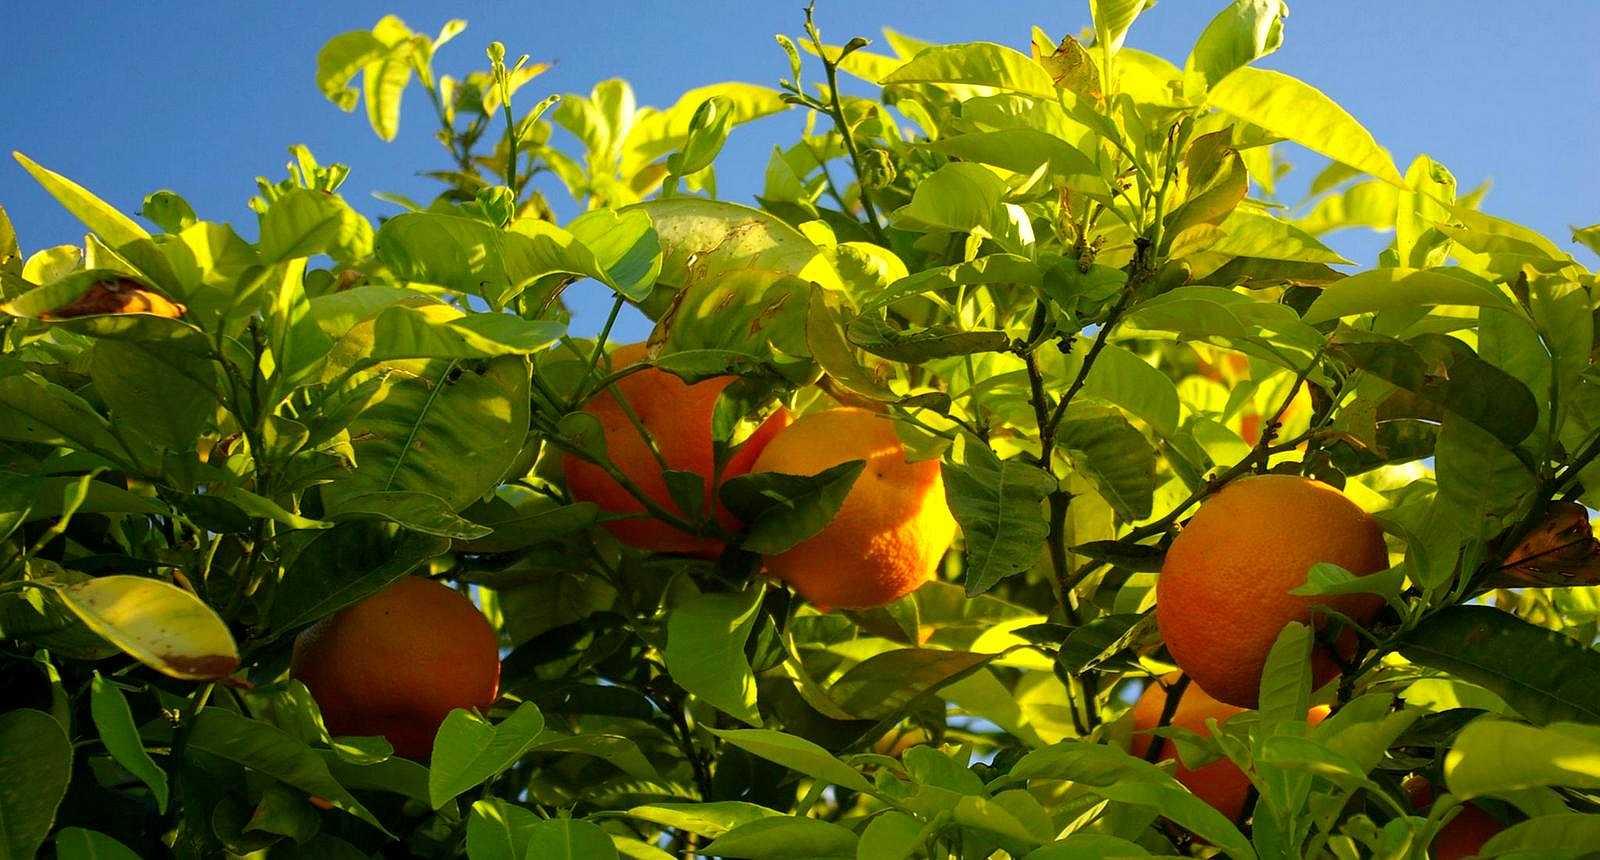 Arbre fruitier à Grasse